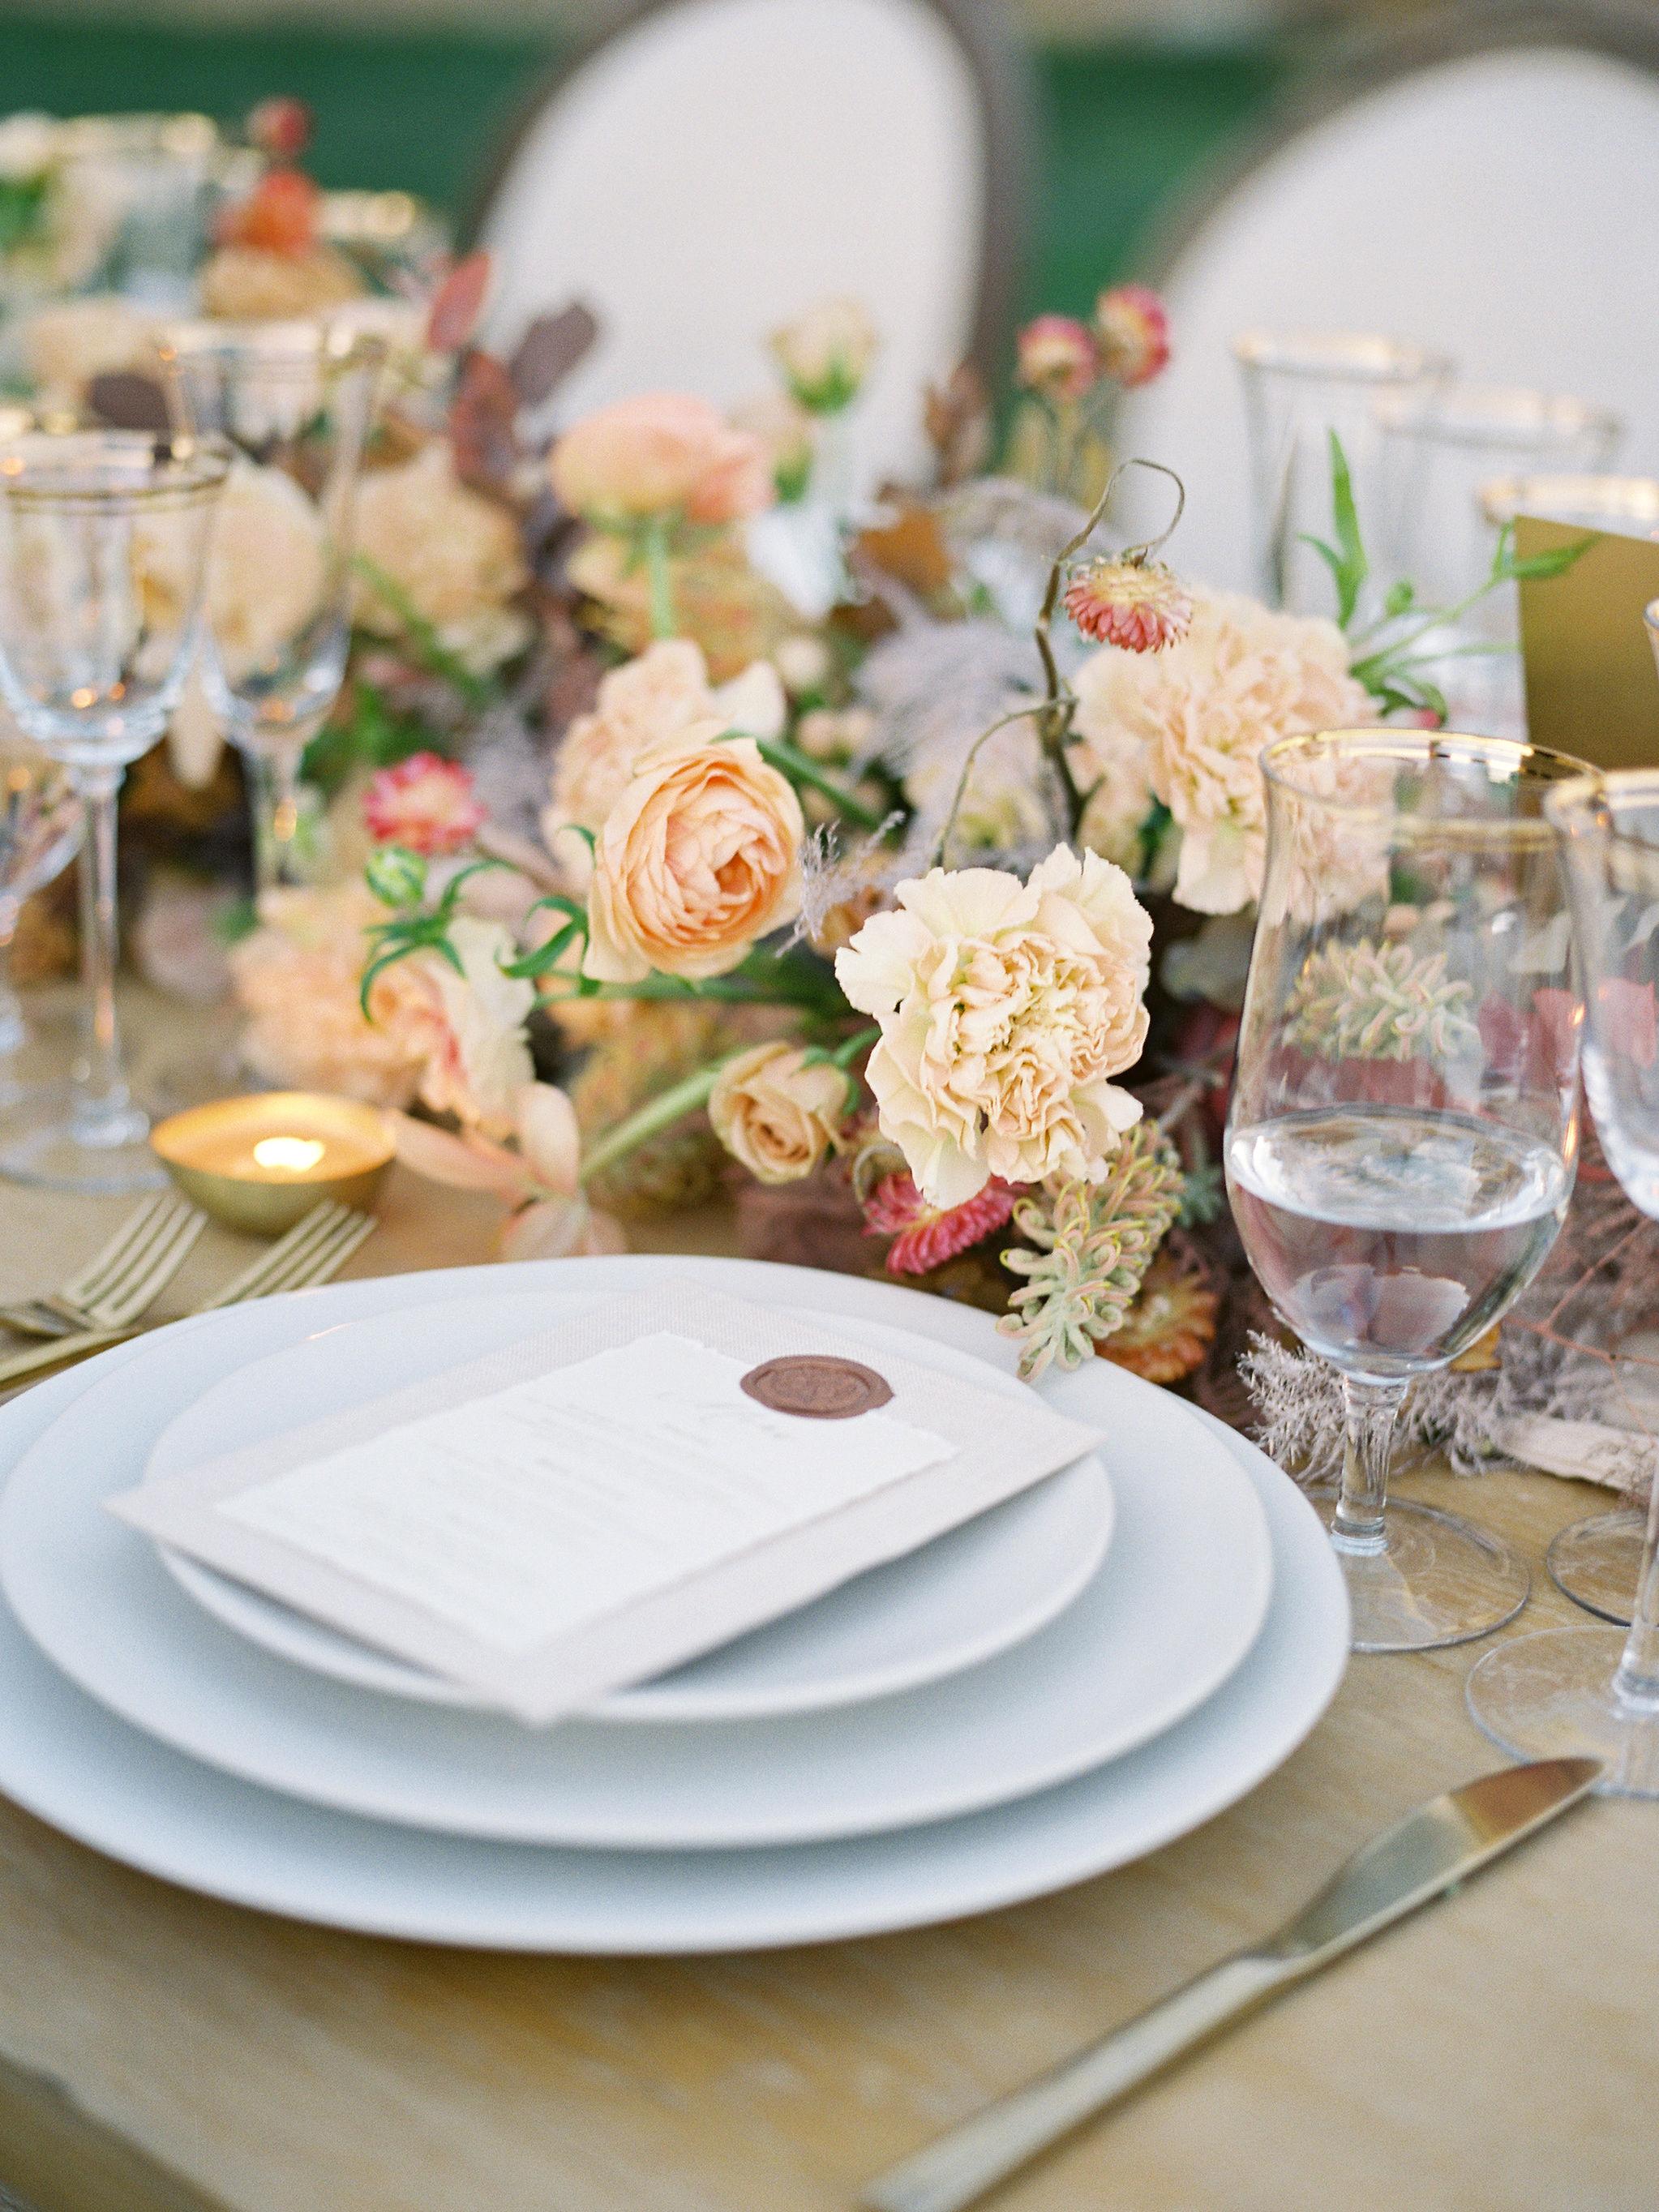 jessica-zimmerman-events-sunstone-wedding-reception-tablescape-dinnerware.jpg